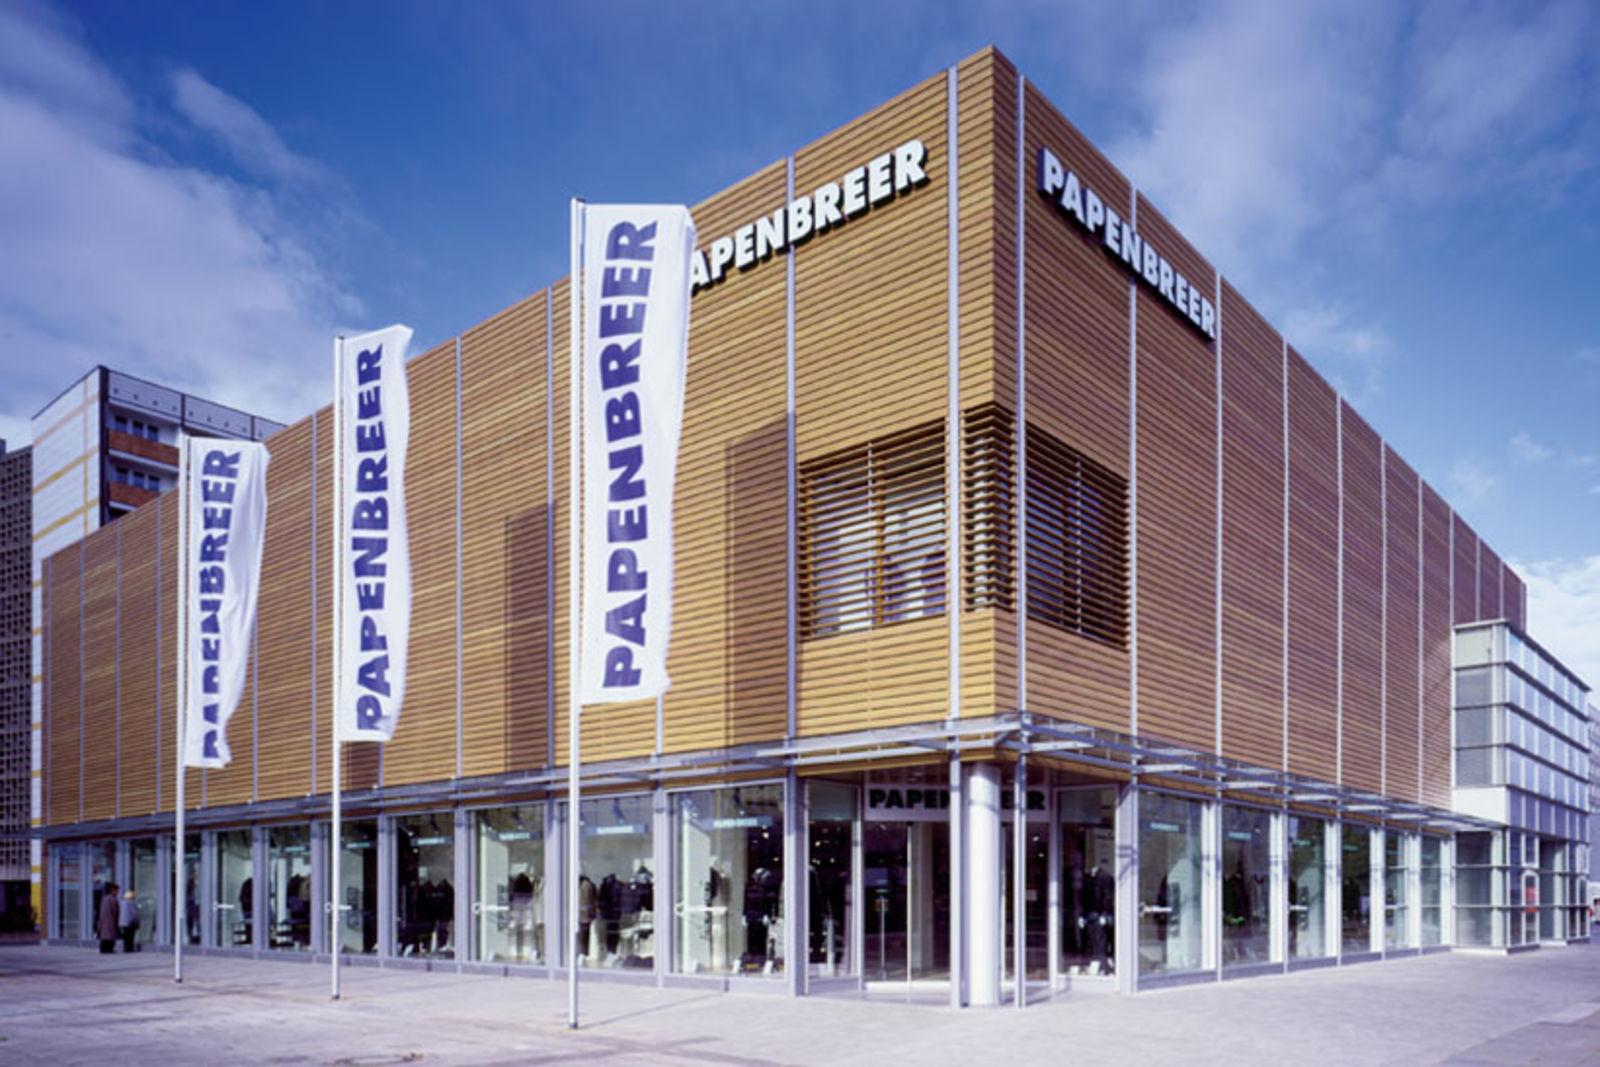 Papenbreer in Magdeburg (Bild 1)